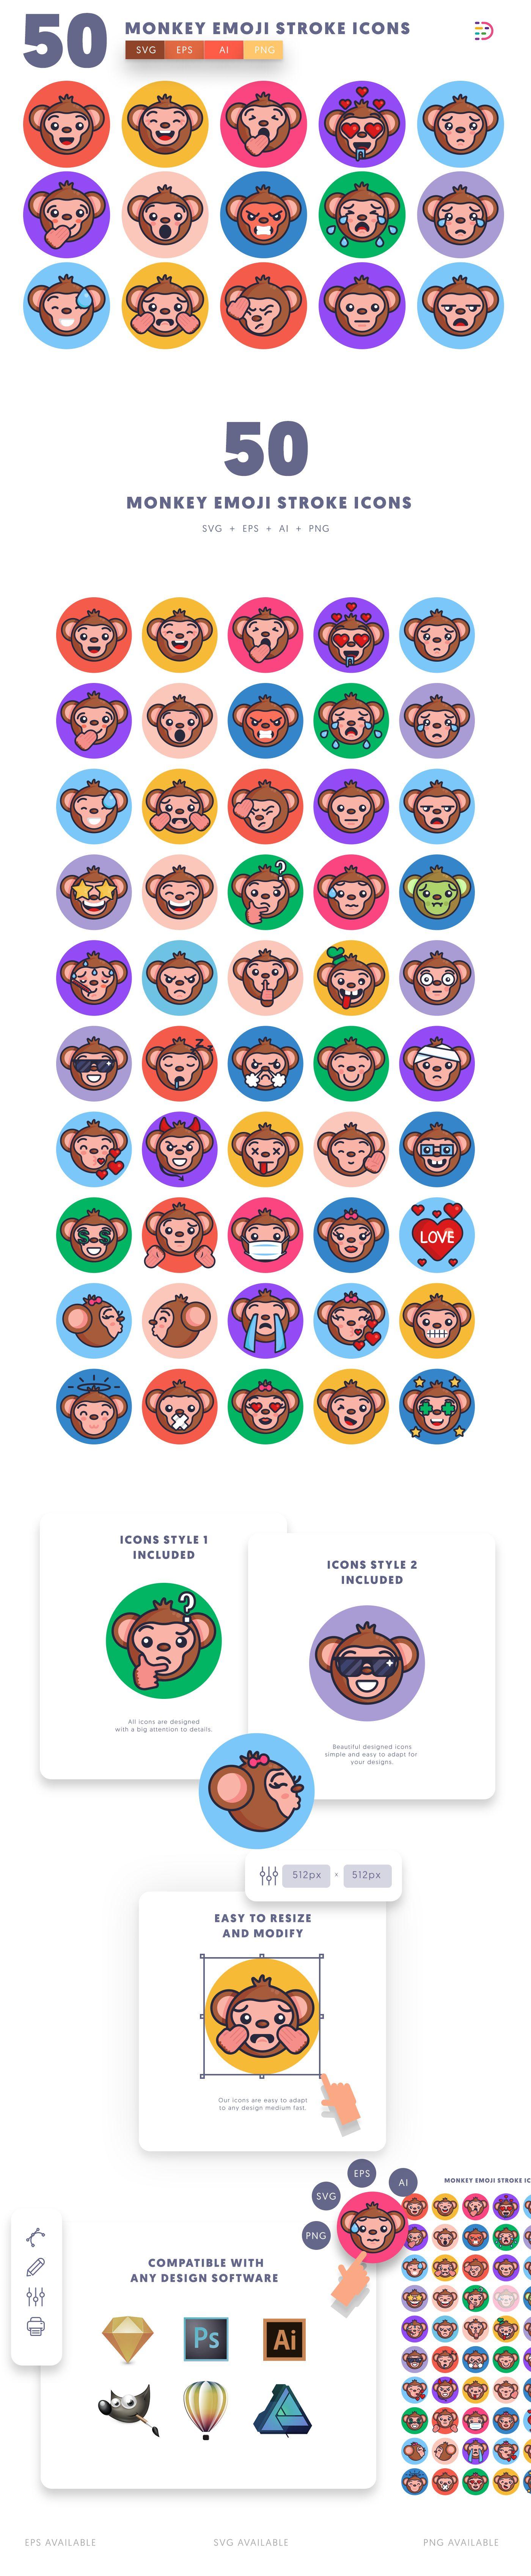 Monkey Emoji Stroke icons info graphic